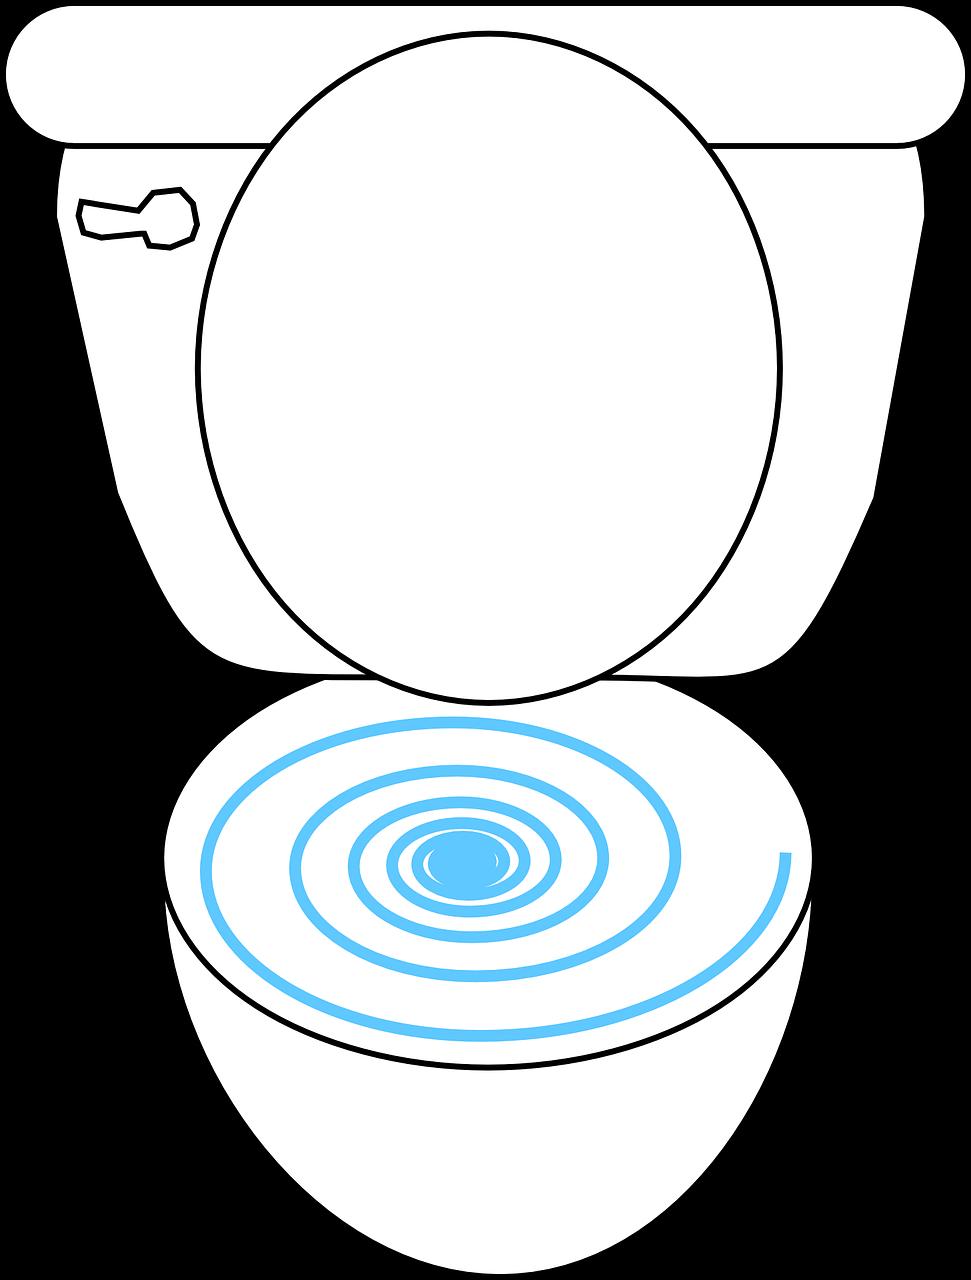 Dog poop clipart. Flushing flushable bags good